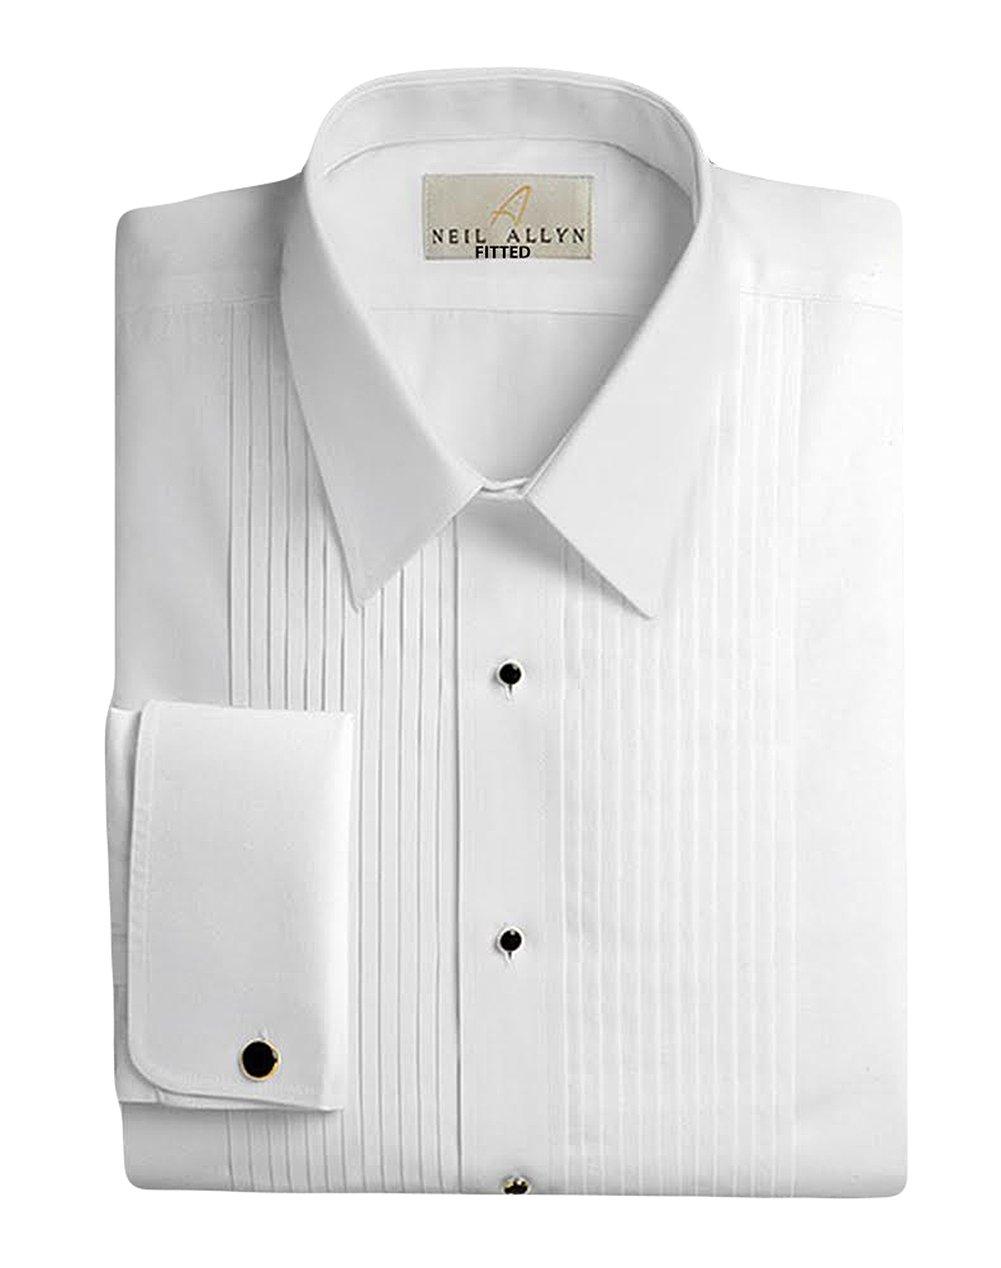 Neil Allyn Men's 100% Cotton Tuxedo Shirt, Slim Fit, 15.5 (34/35)